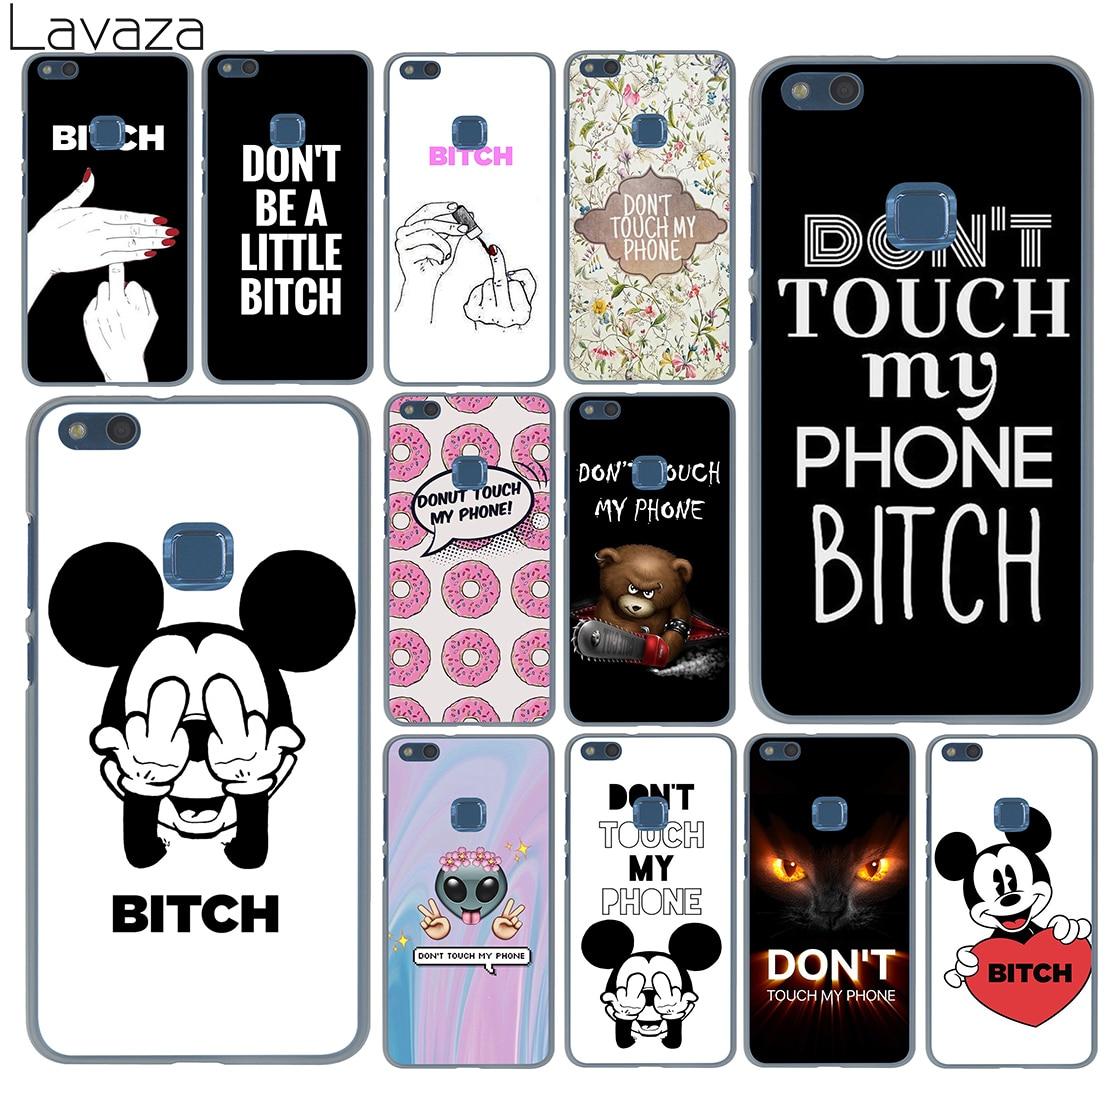 fa9c2bd537a Lavaza Bitch Don't touch my phone Cover Case for Huawei P20 P9 P10 Plus P8  Mate 20 Pro 10 Lite Mini 2016 2017 P smart 2019